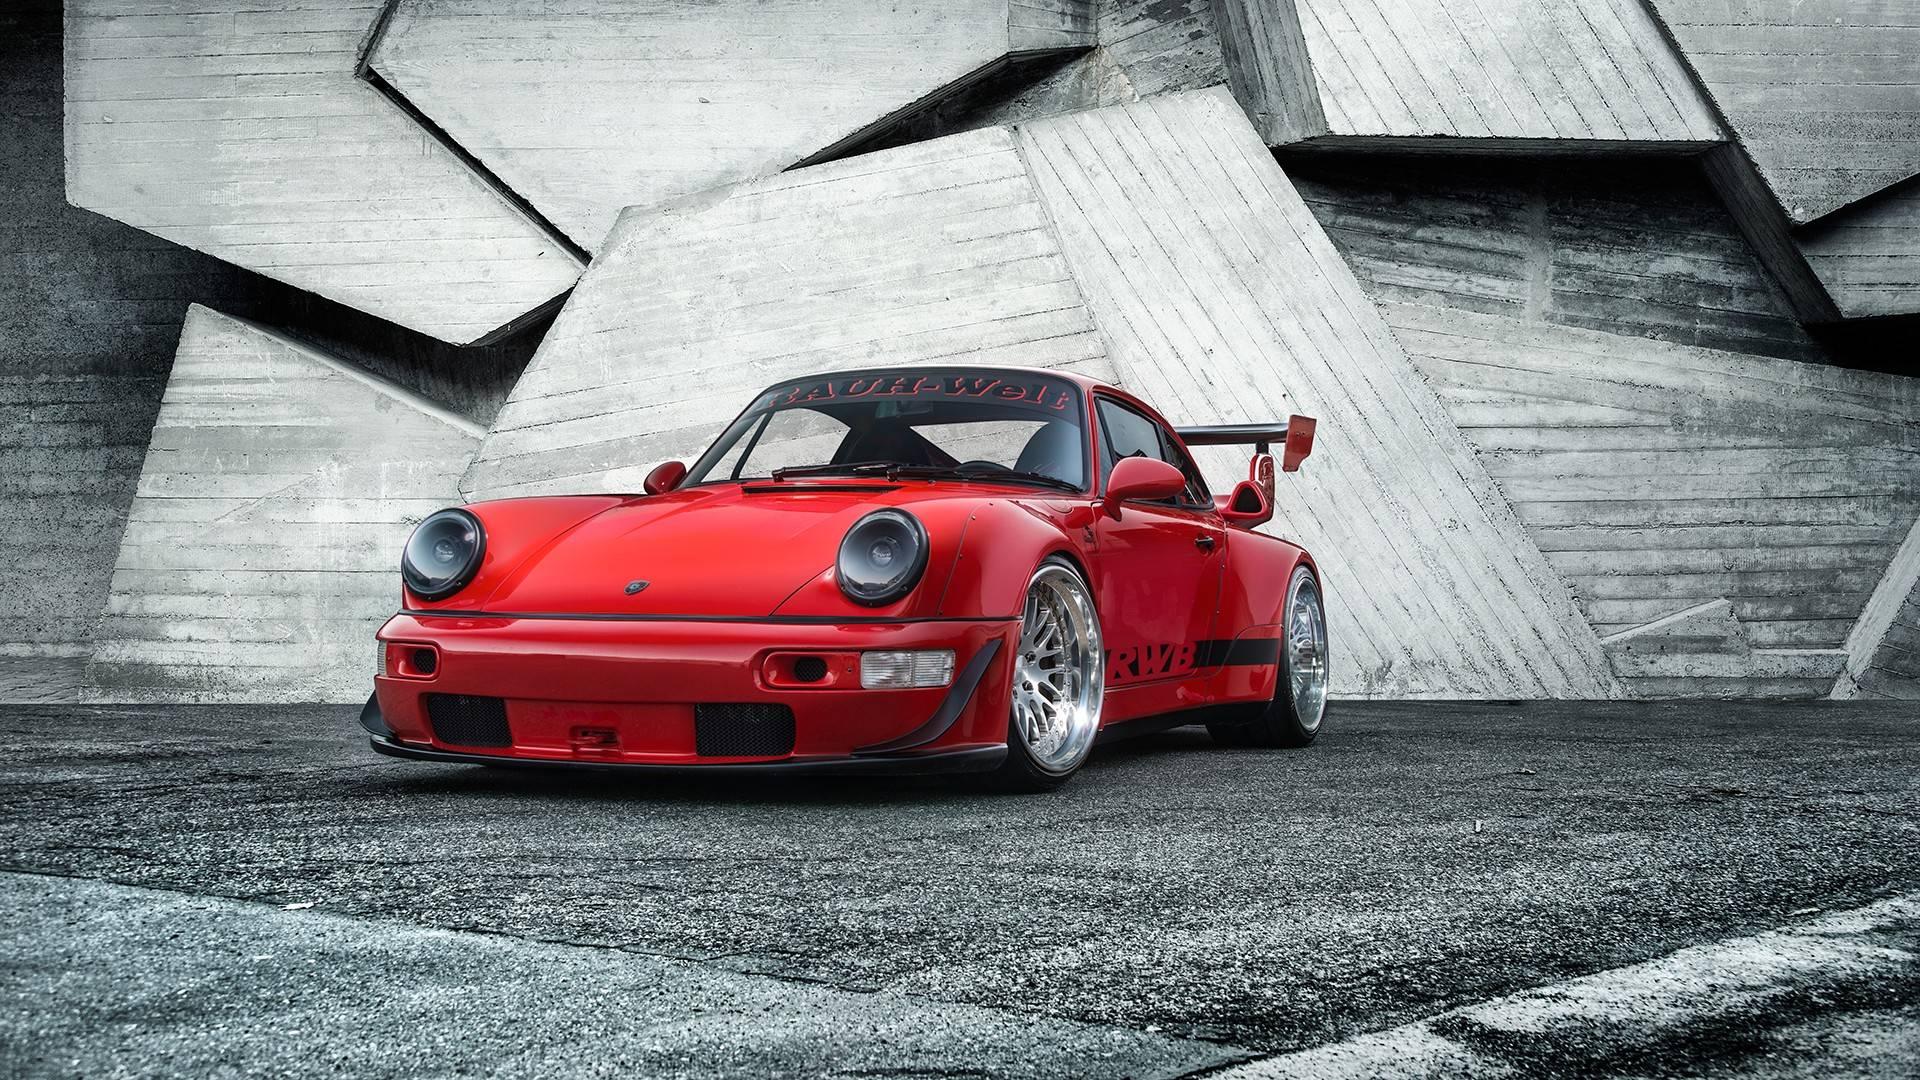 RWB Modified Porsche 911 Is Former SEMA Star Now Up For Sale 1920x1080